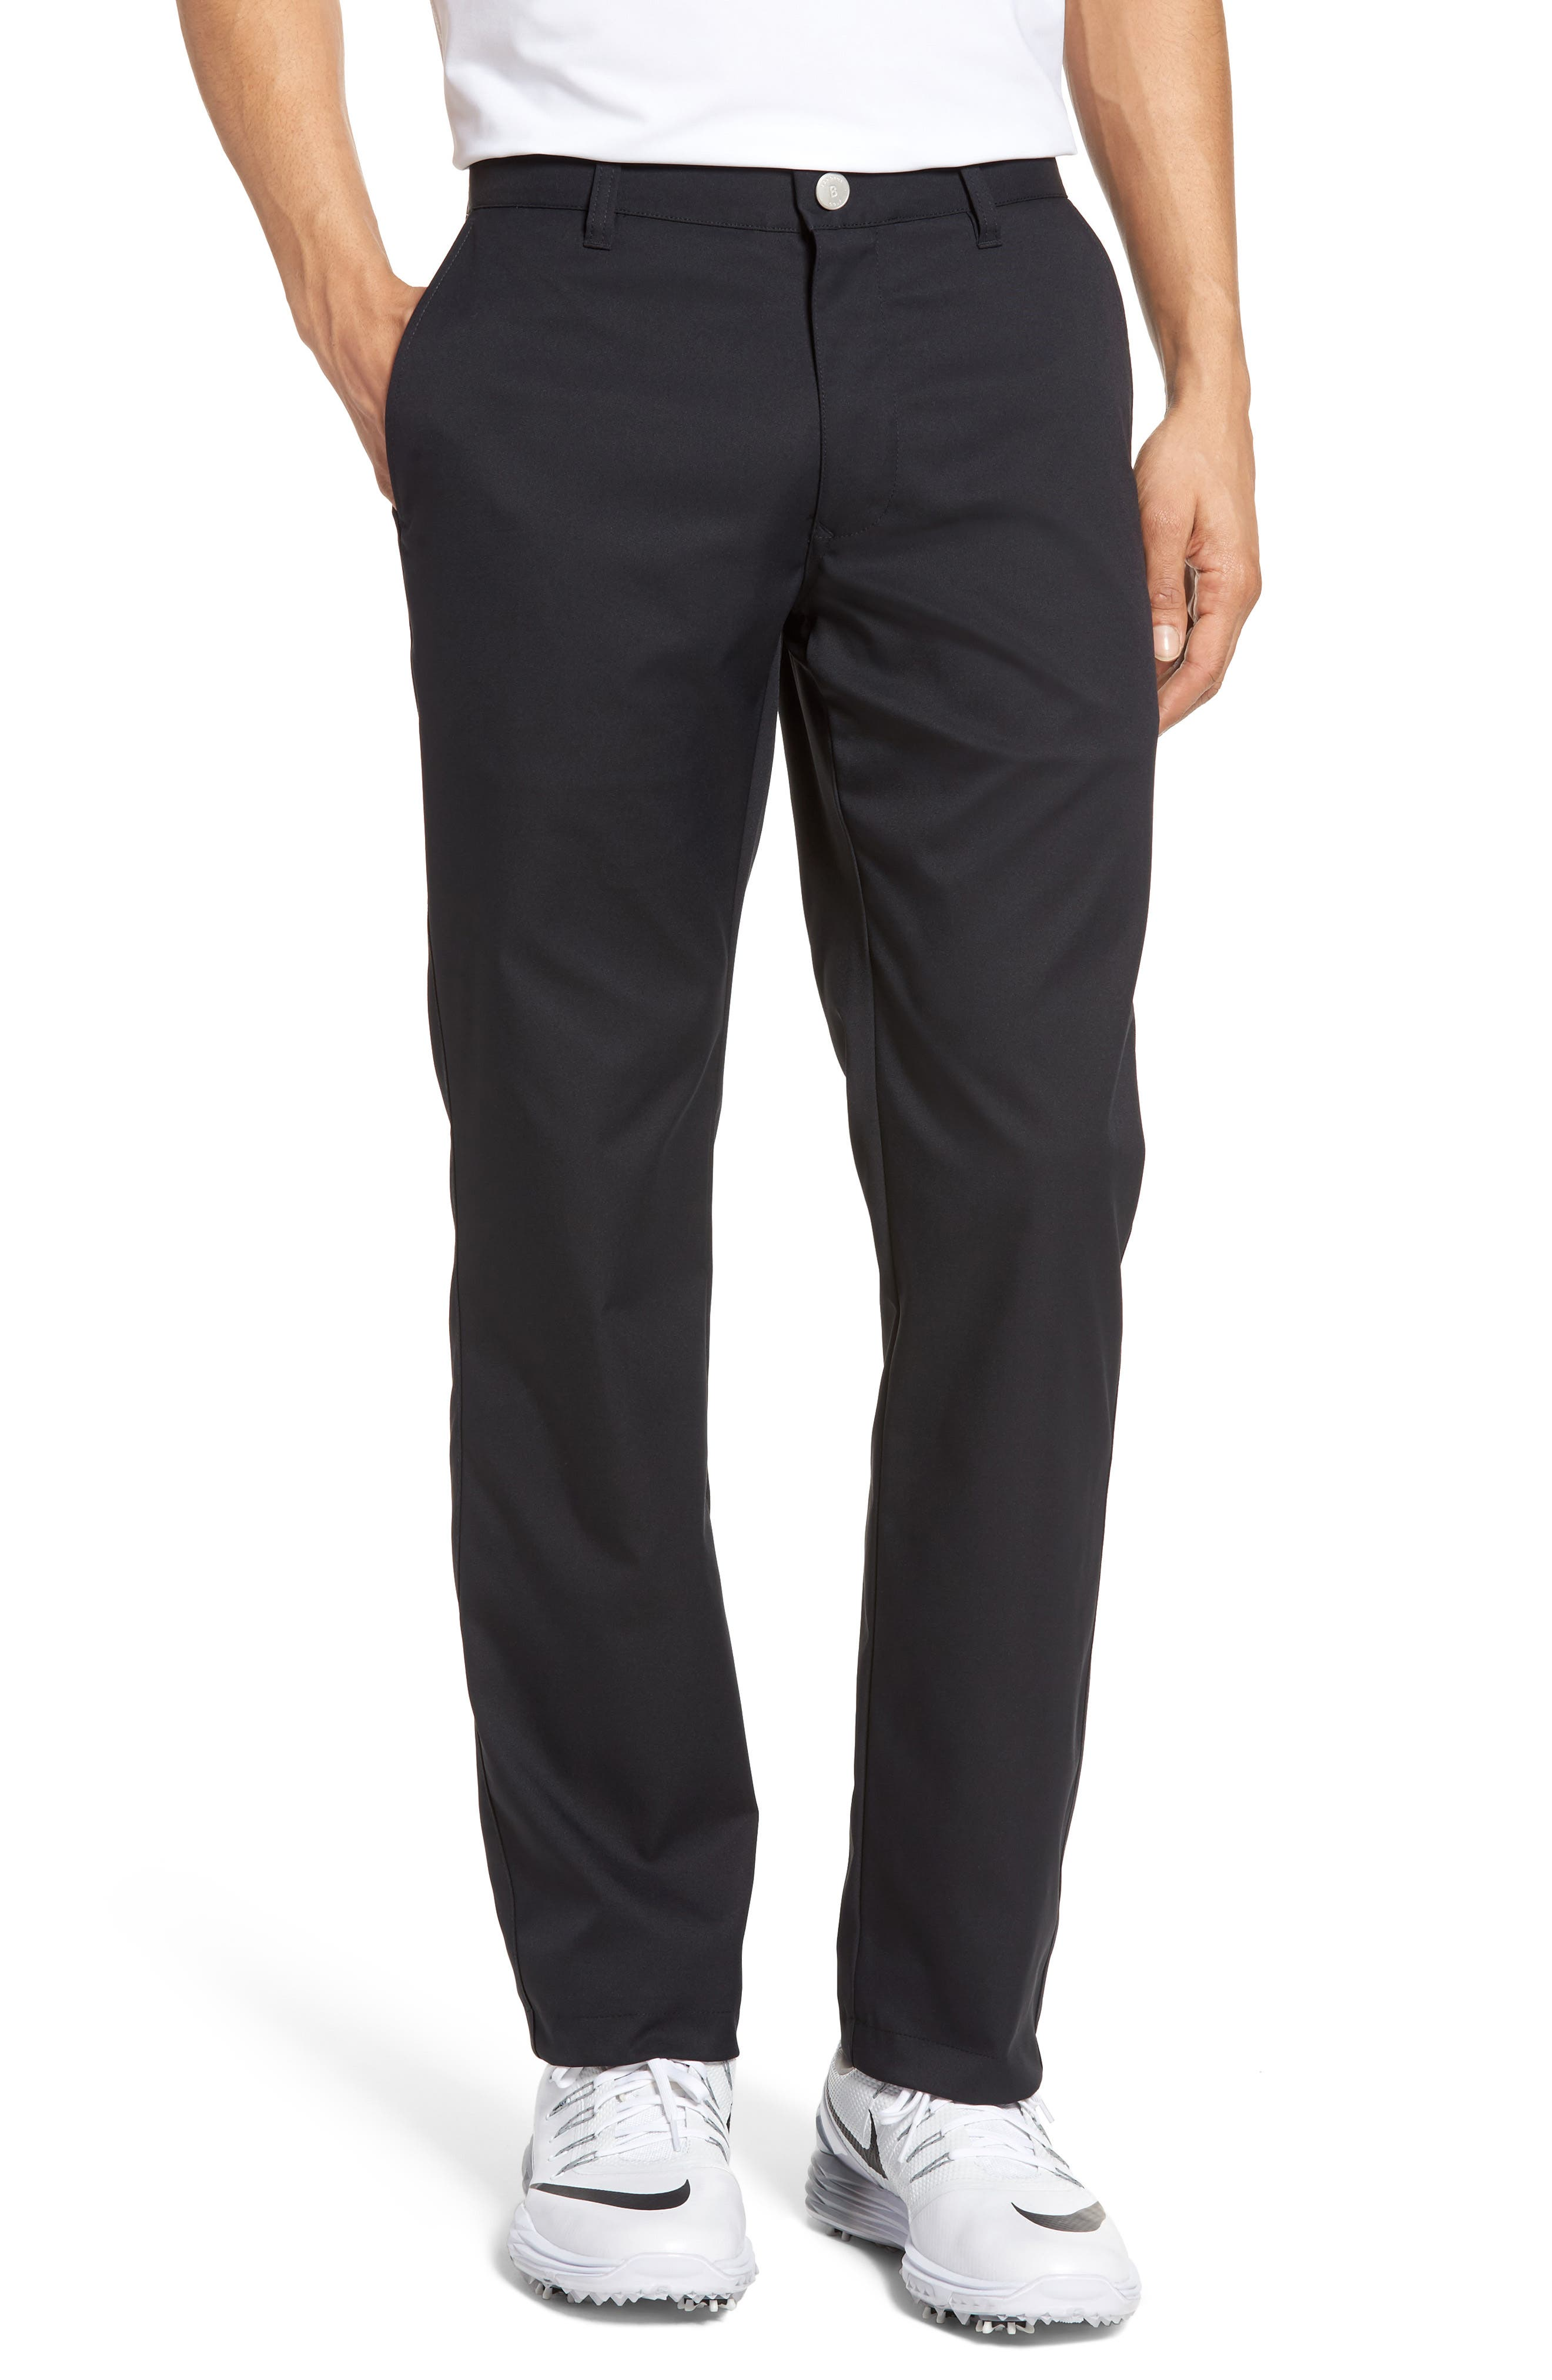 Highland Slim Fit Golf Pants